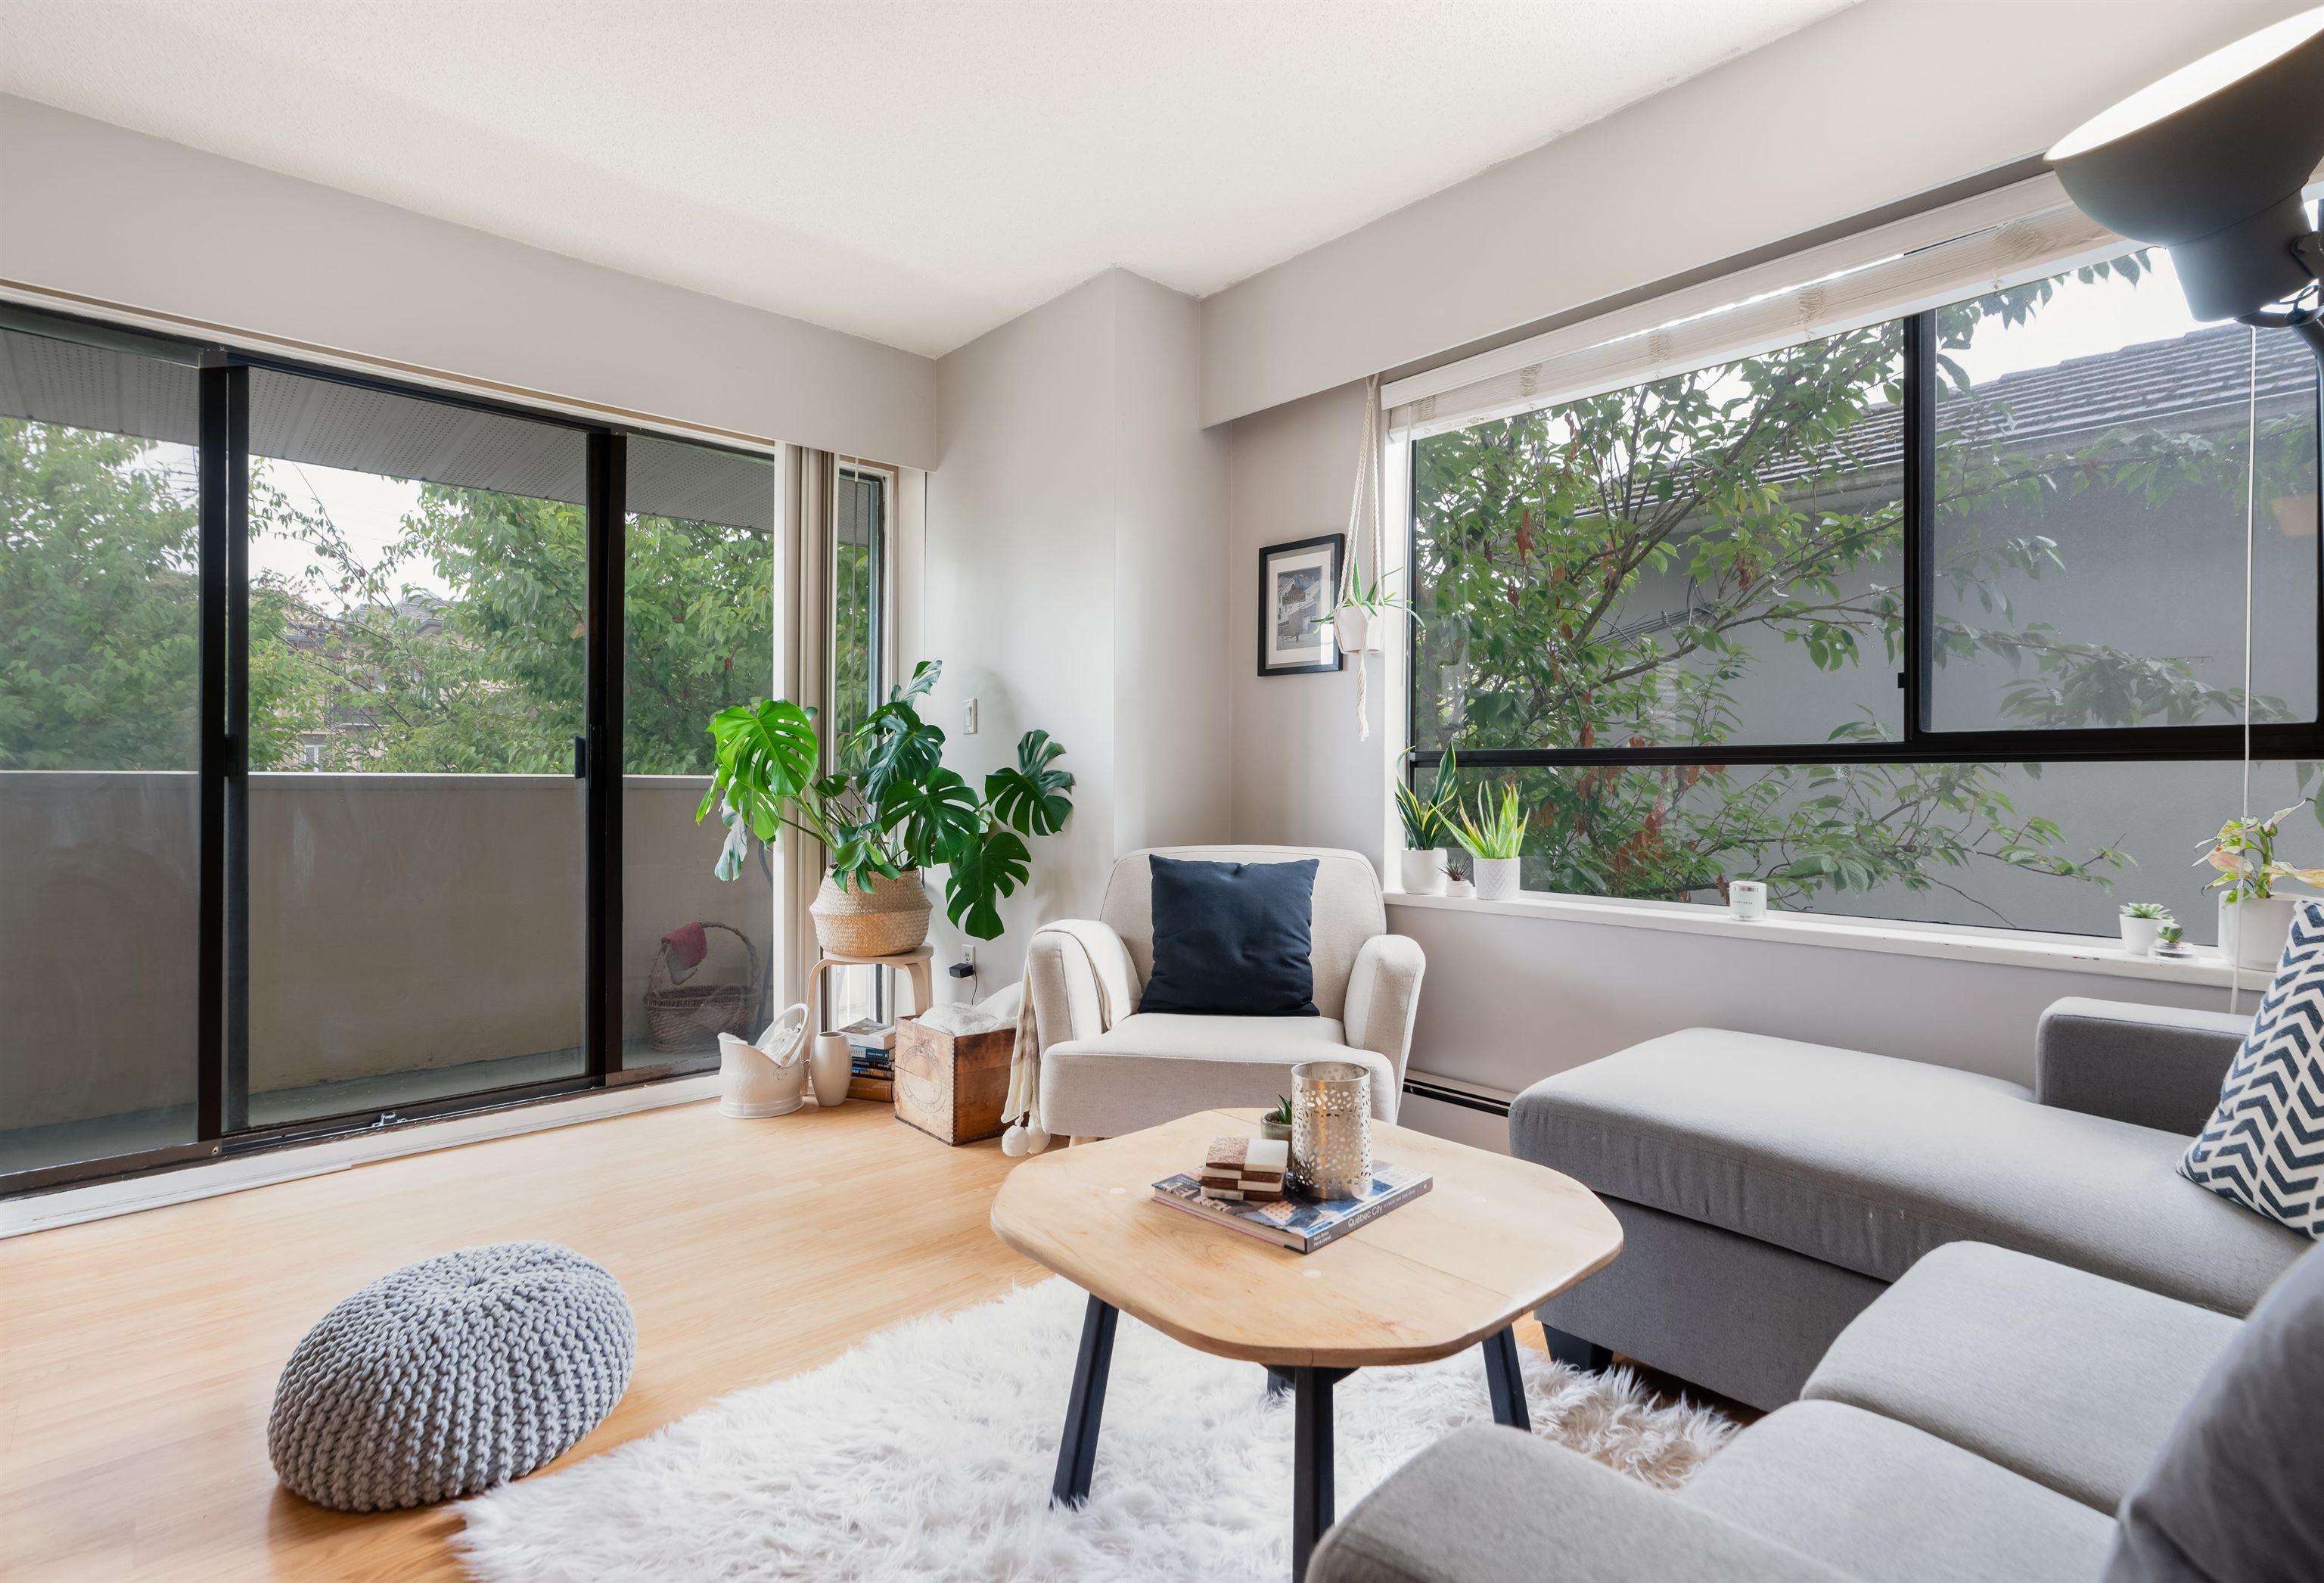 201 474 E 43RD AVENUE - Fraser VE Apartment/Condo for sale, 1 Bedroom (R2618466) - #1